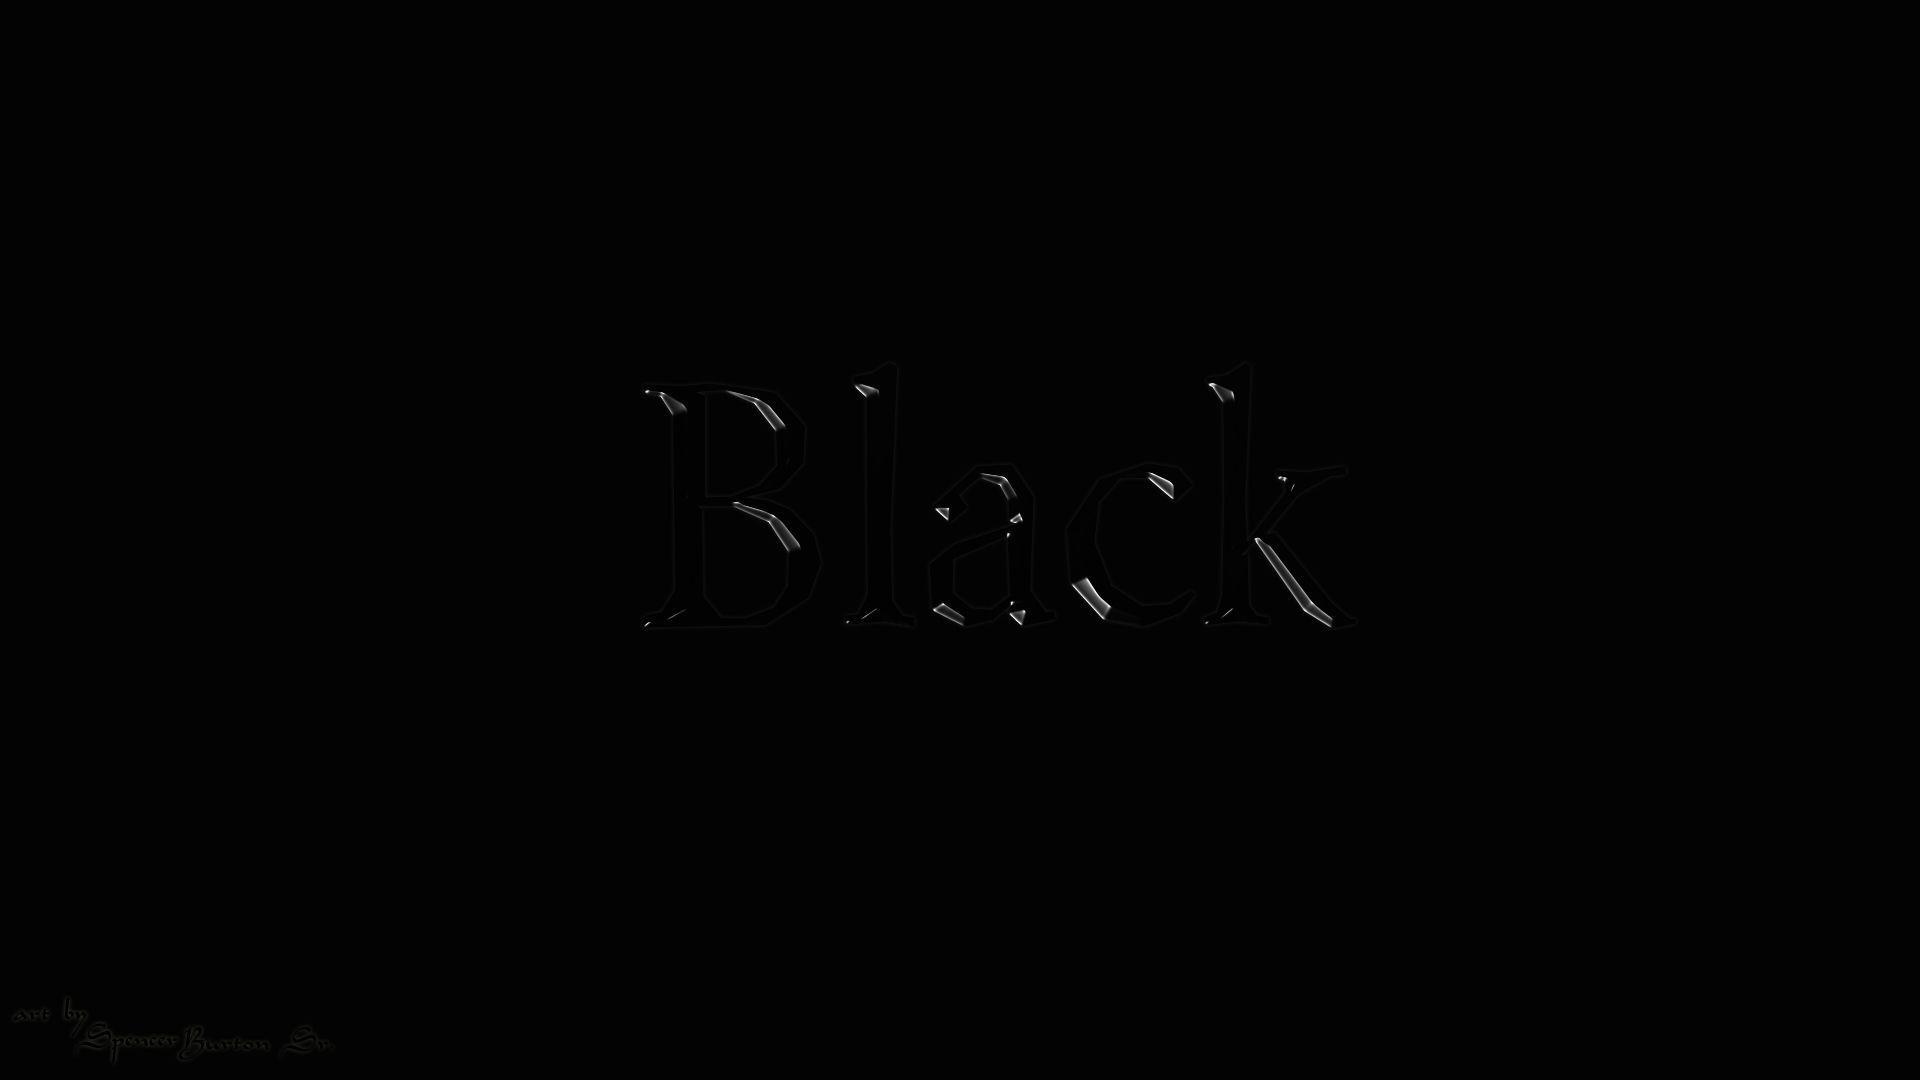 Black Wallpapers 1080p – Wallpaper Cave